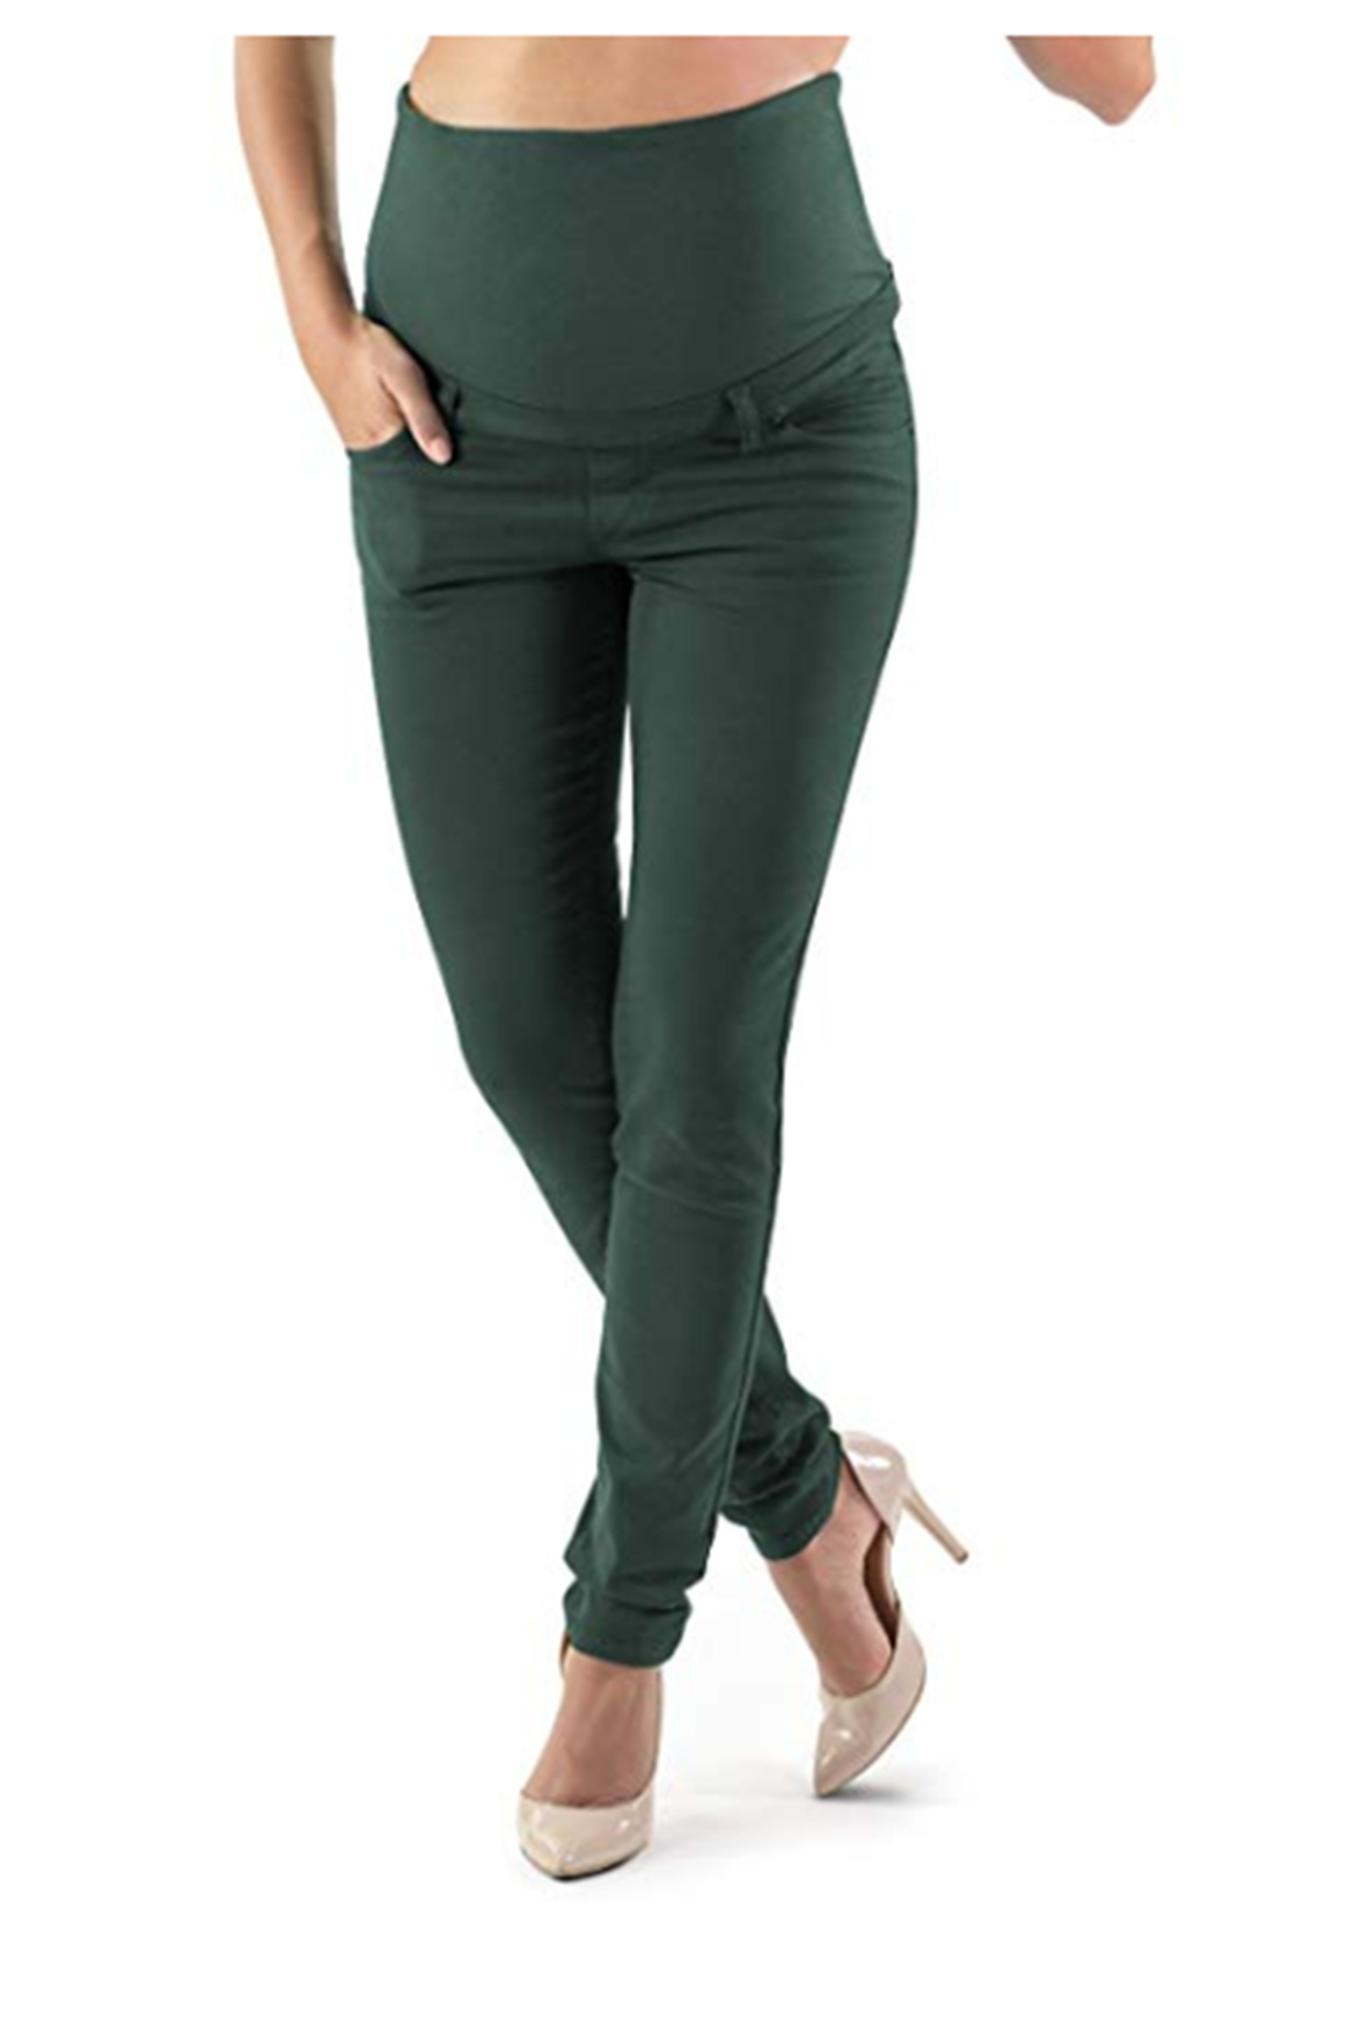 maternity clothes - venezia skinny maternity pants